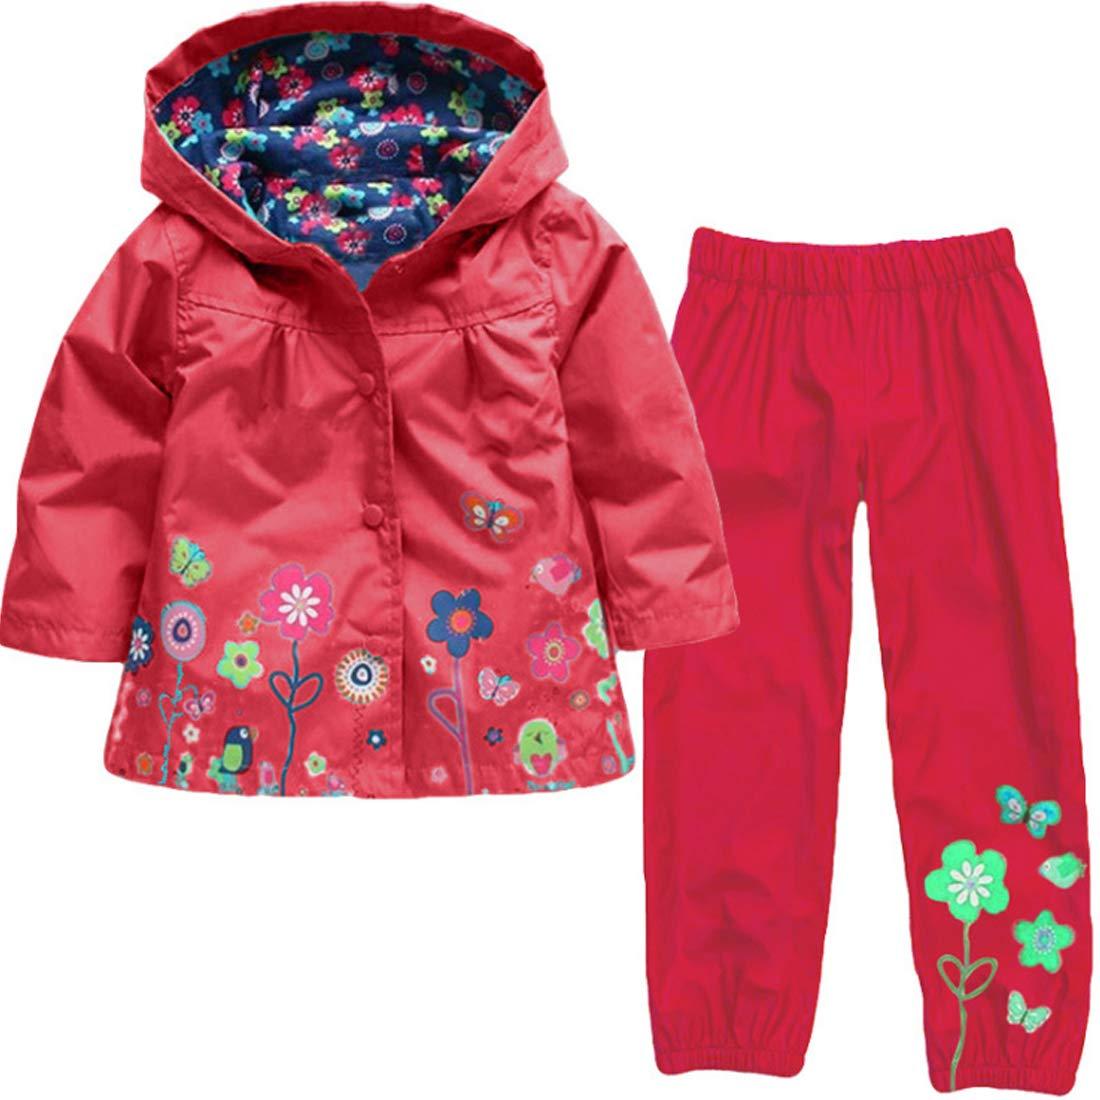 Fulision Little Girl Child Cute Flower Hooded Jacket Raincoat Girl 2-8 Years Old